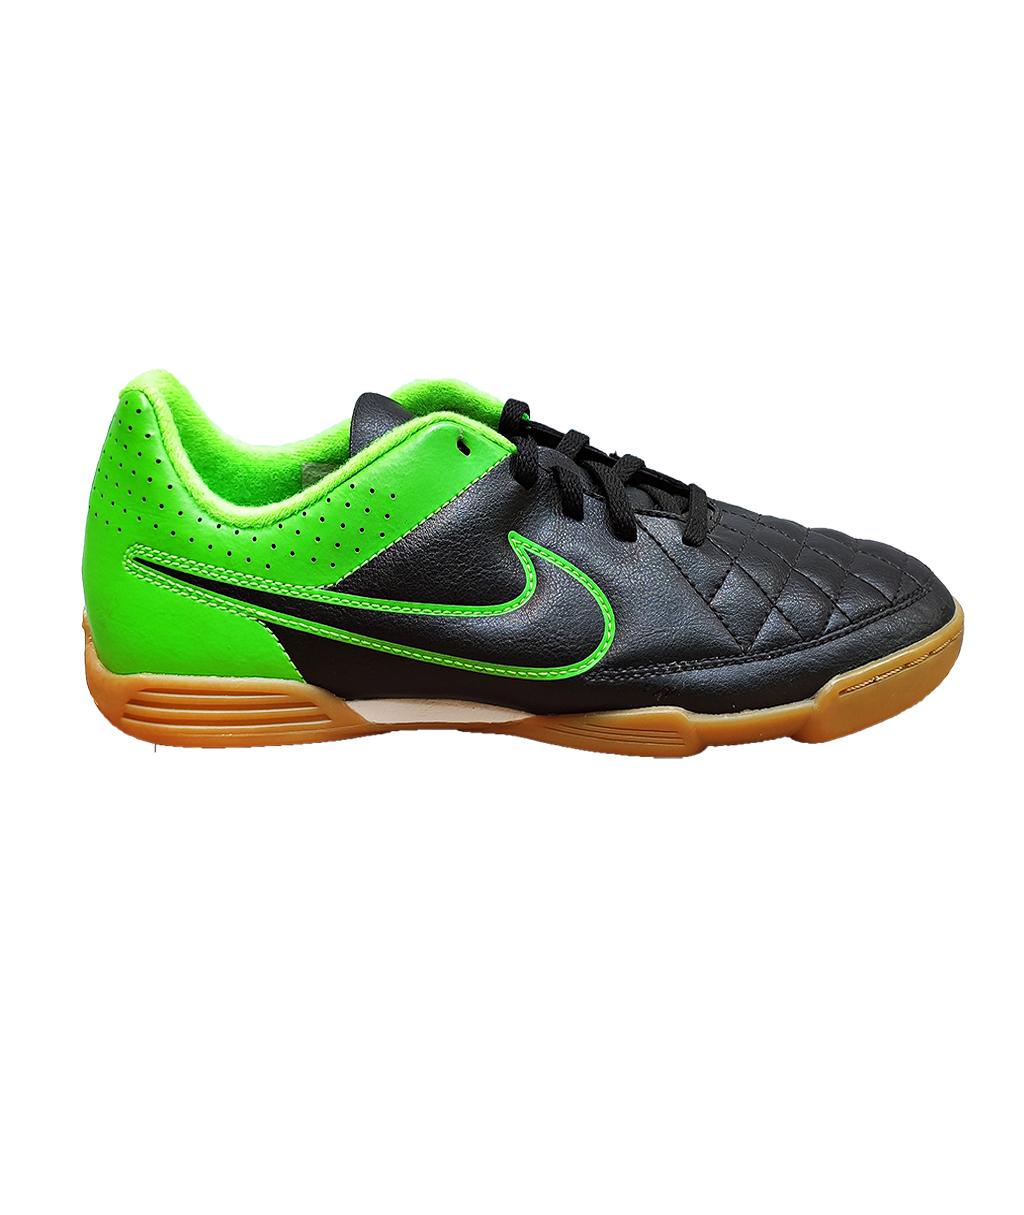 Купить детские футзалки Nike Tiempo RIO II 631525-003 в Новосибирске